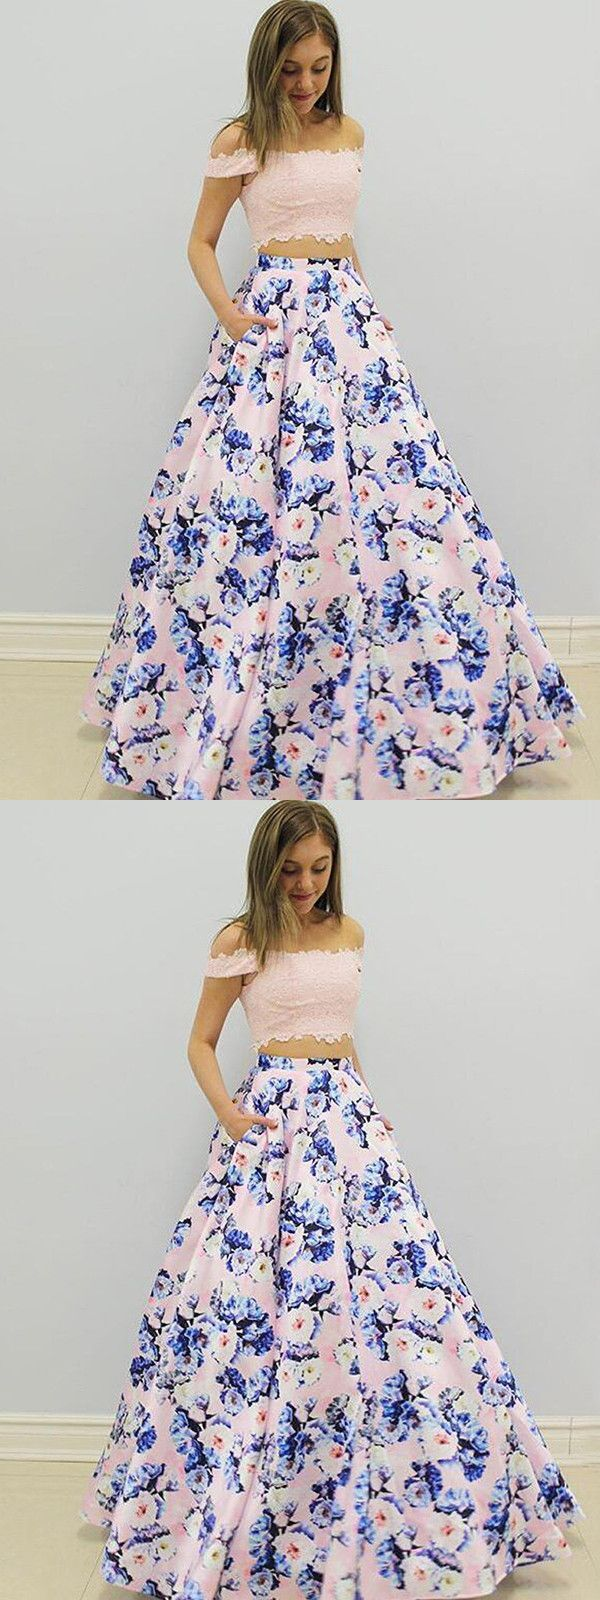 Prom dress longprom dress modestprom dress simpleprom dress cheap